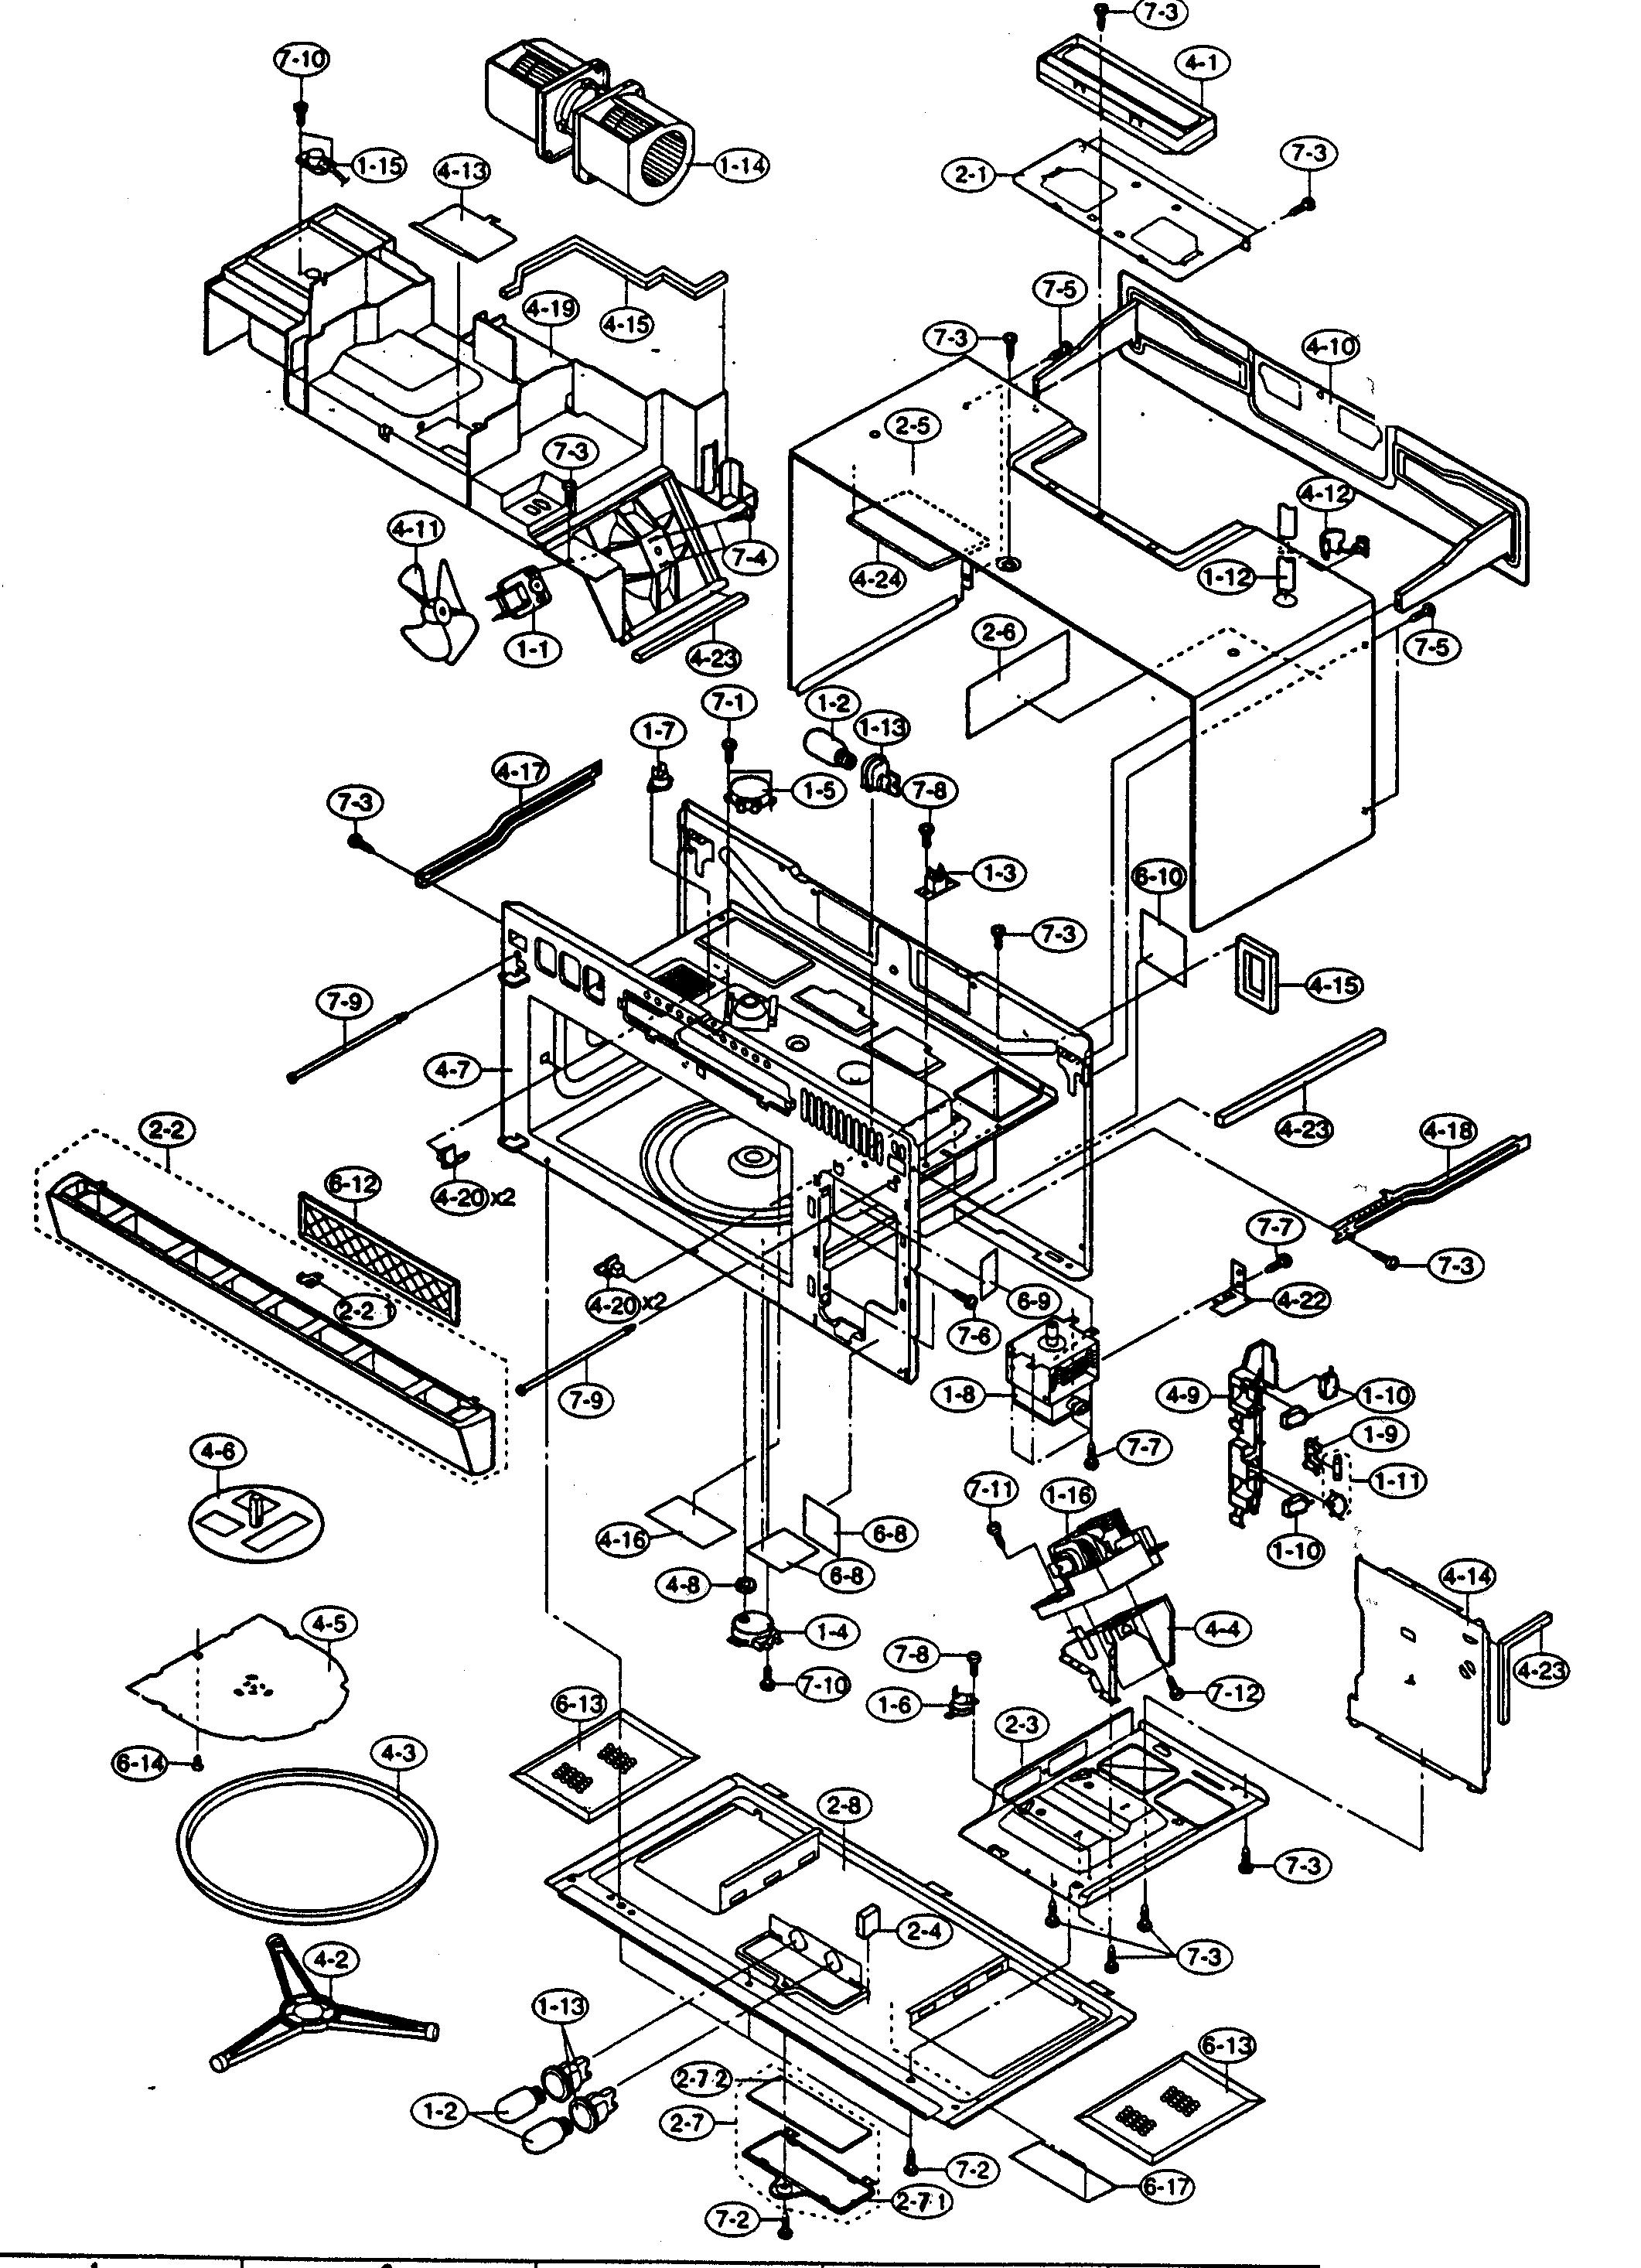 sharp microwave wiring diagram get free image about wiring diagram